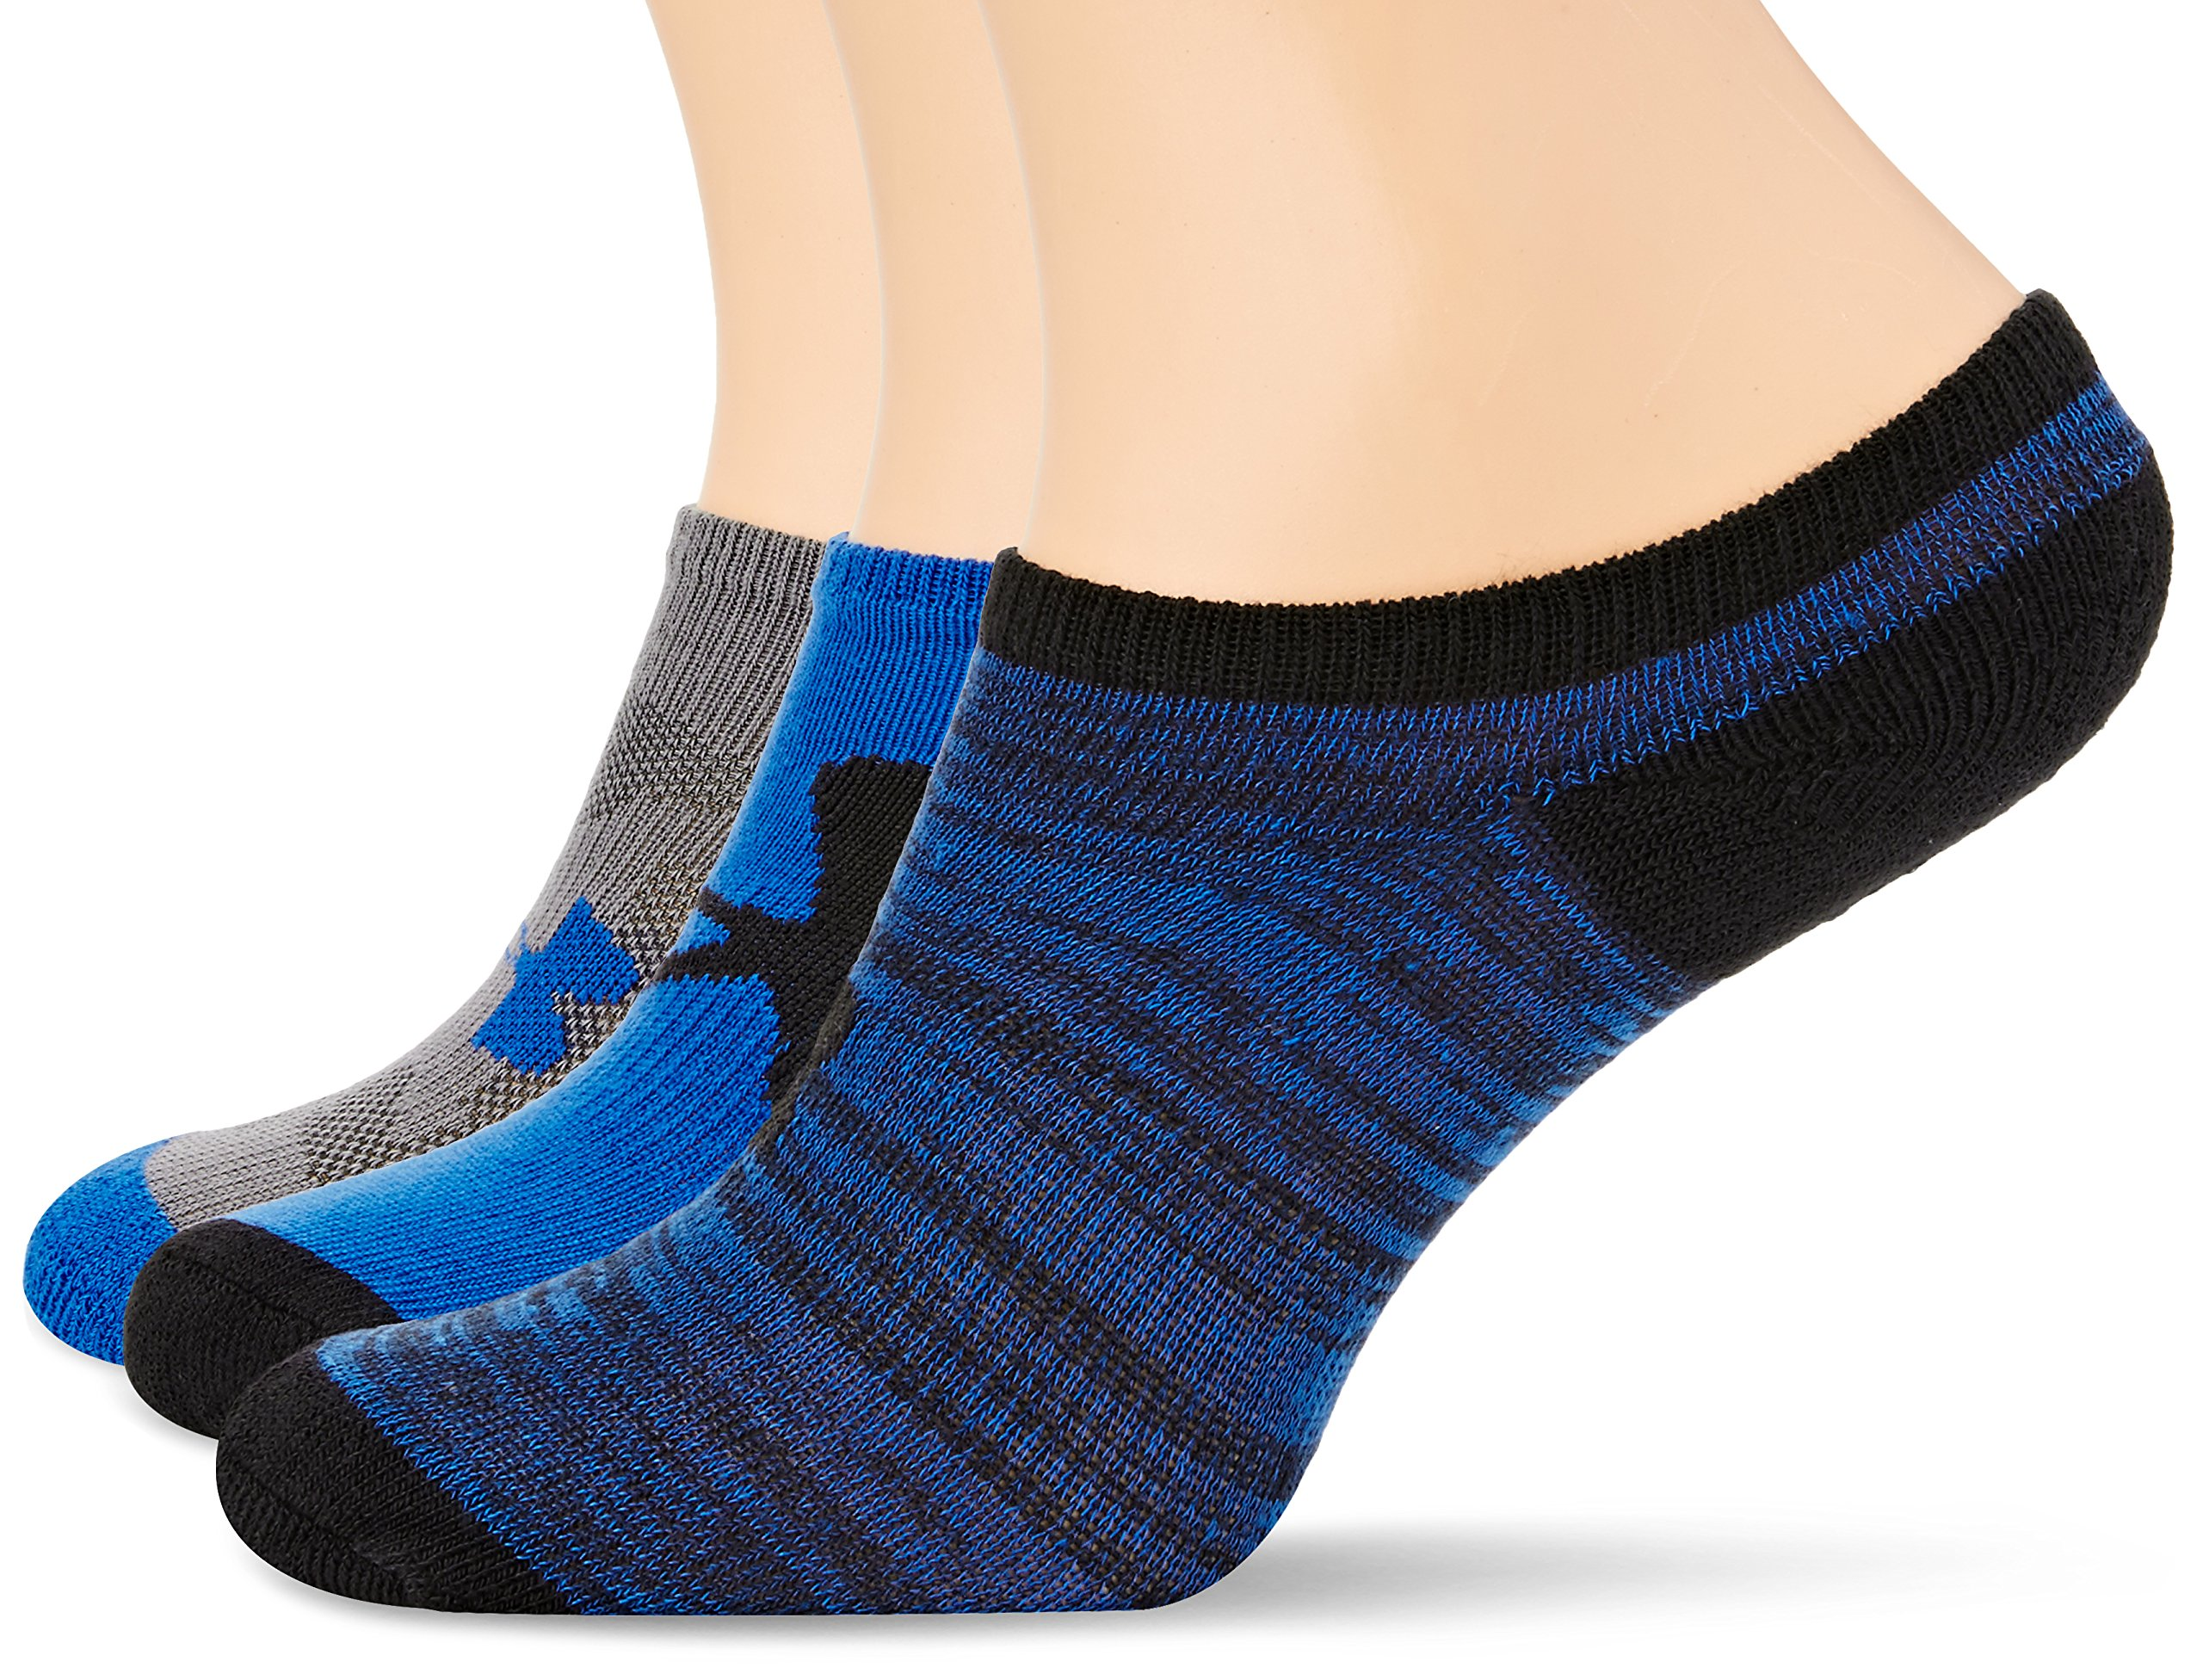 Under Armour Unisex UA Next No Show 3-Pack (Big Kid) Ultra Blue/Assorted Sock